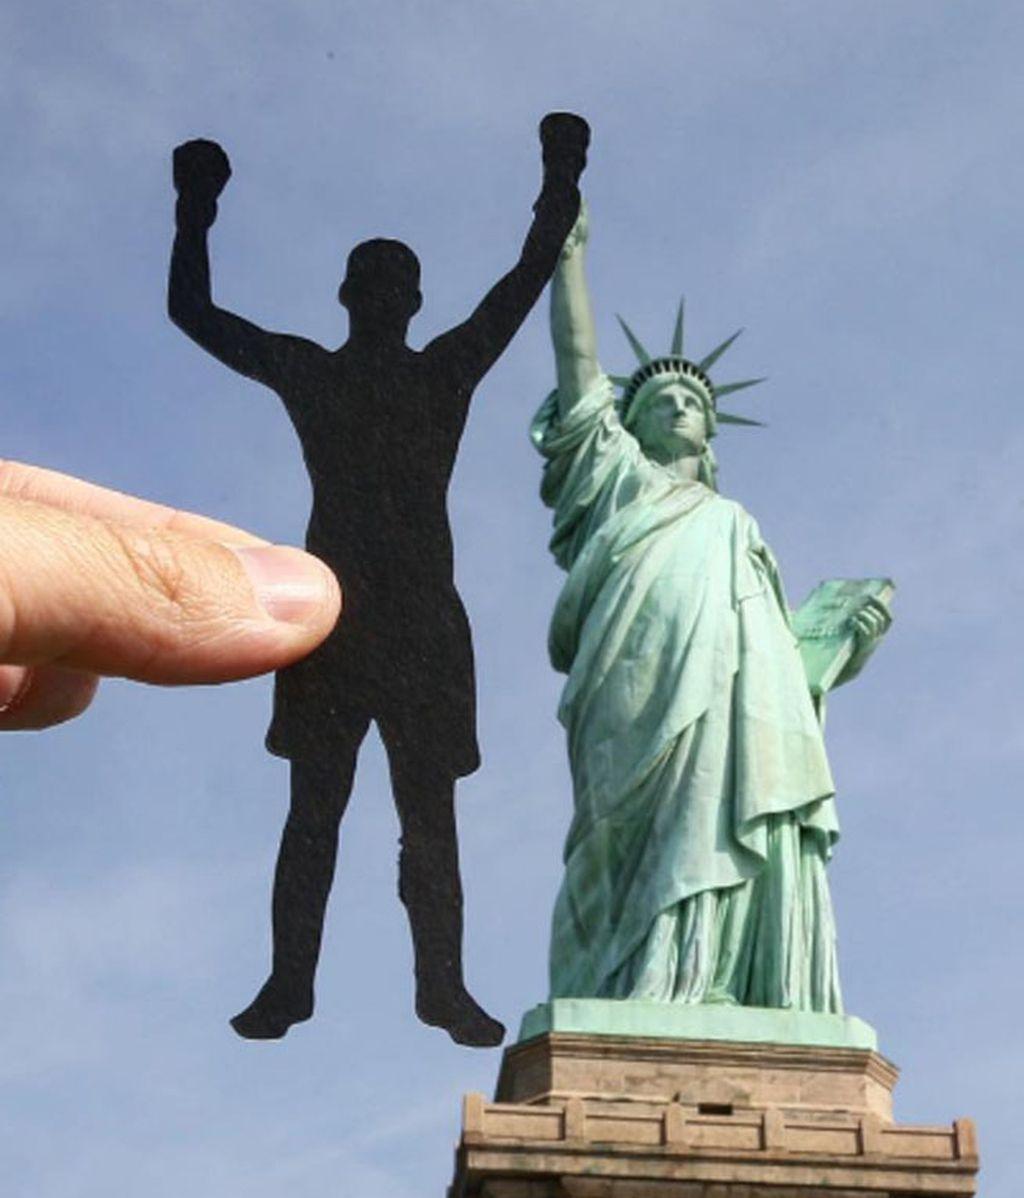 La Estatua de la Libertad da la mano al icono del boxeo Muhammad Ali